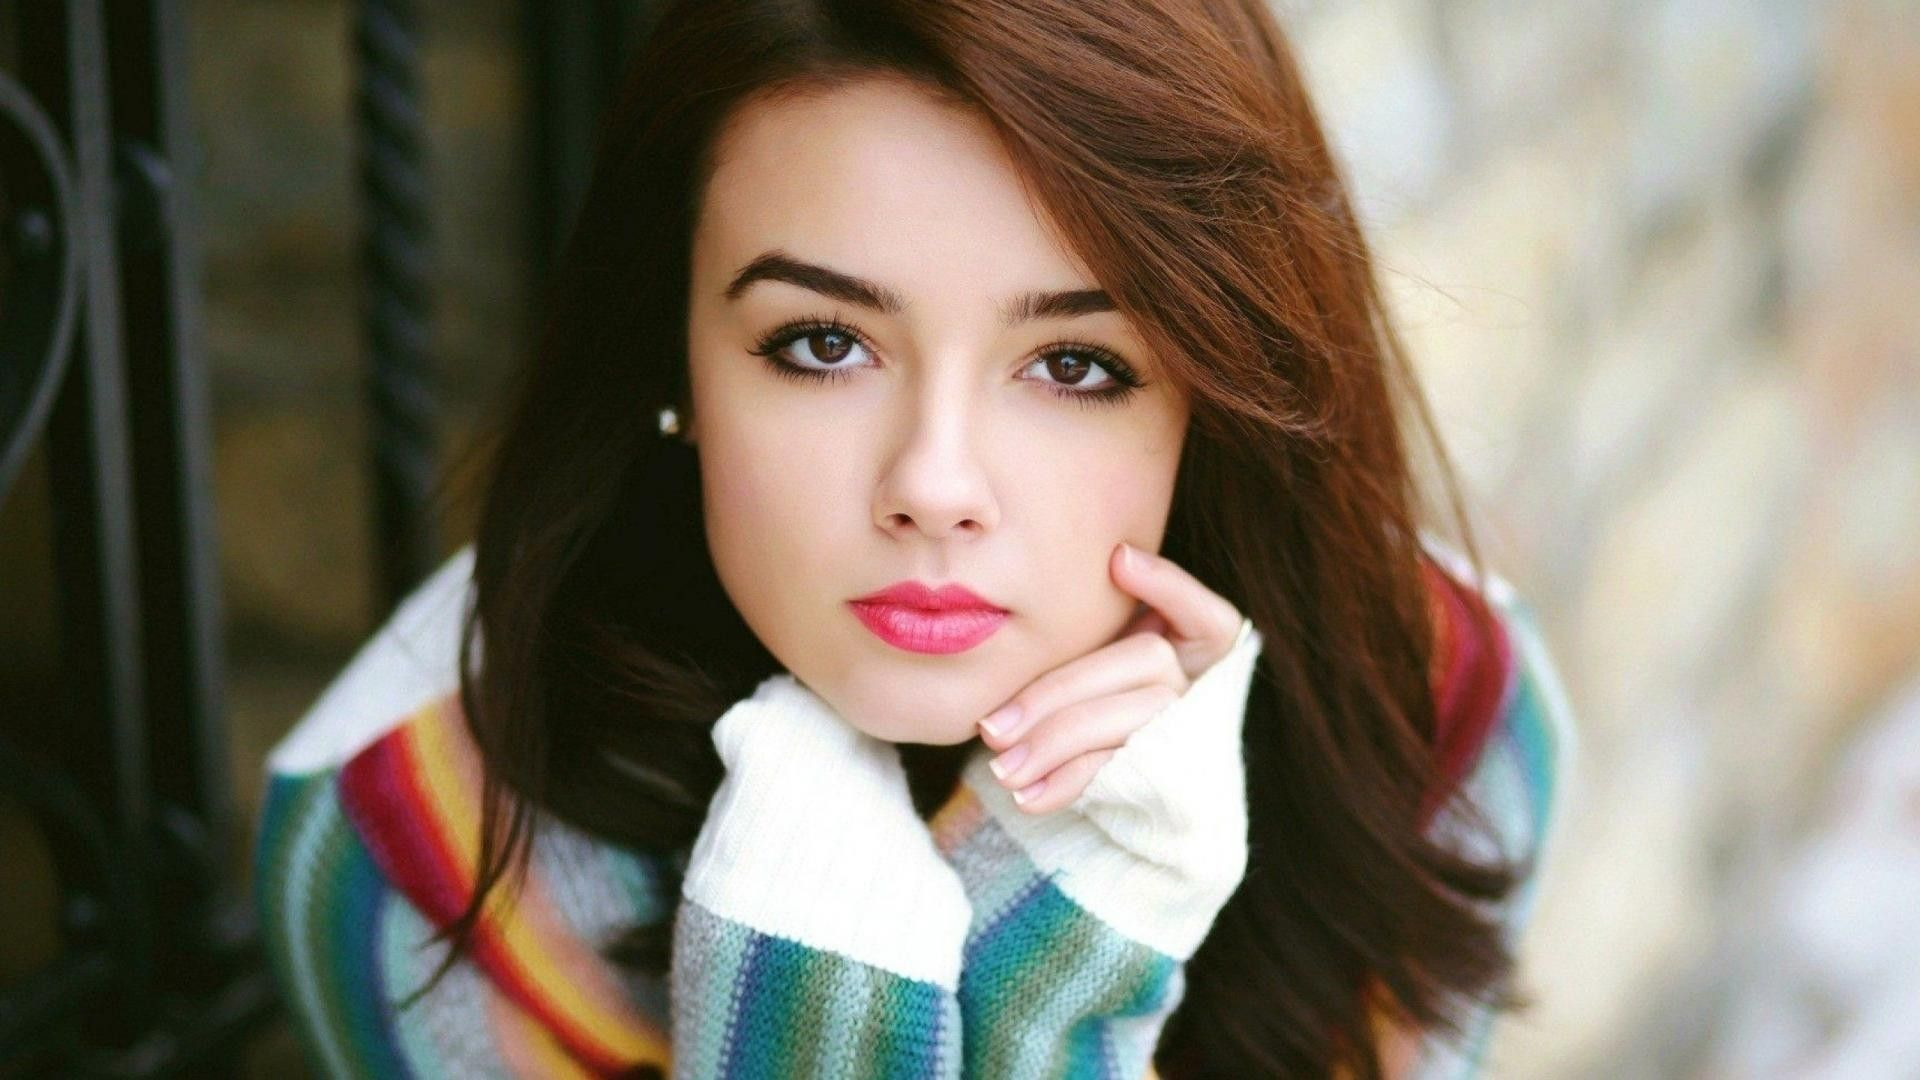 Beautiful Girls Desktop Wallpapers Top Free Beautiful Girls Desktop Backgrounds Wallpaperaccess